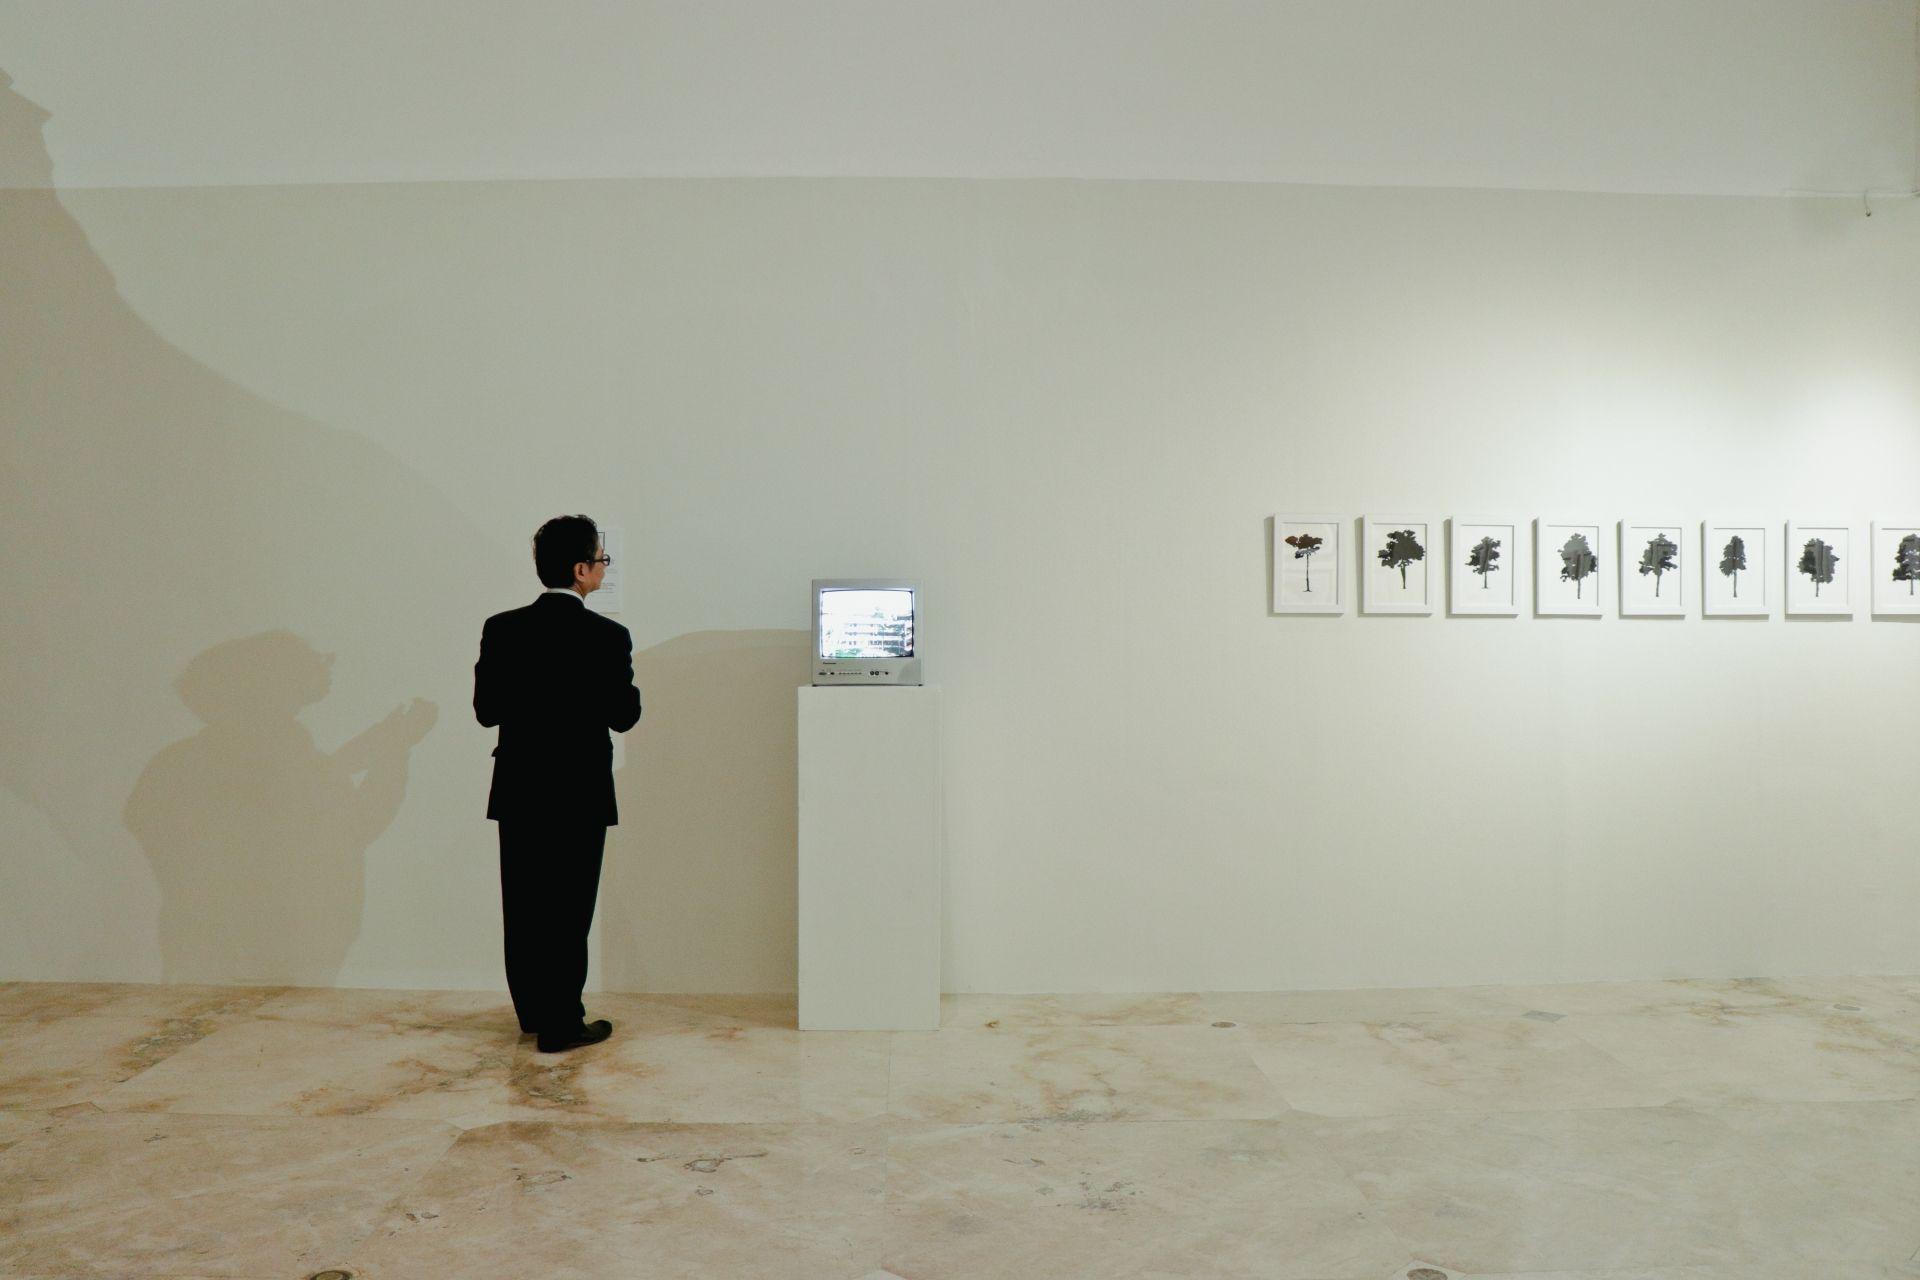 10 ASEAN Nations Meet In One Exhibit